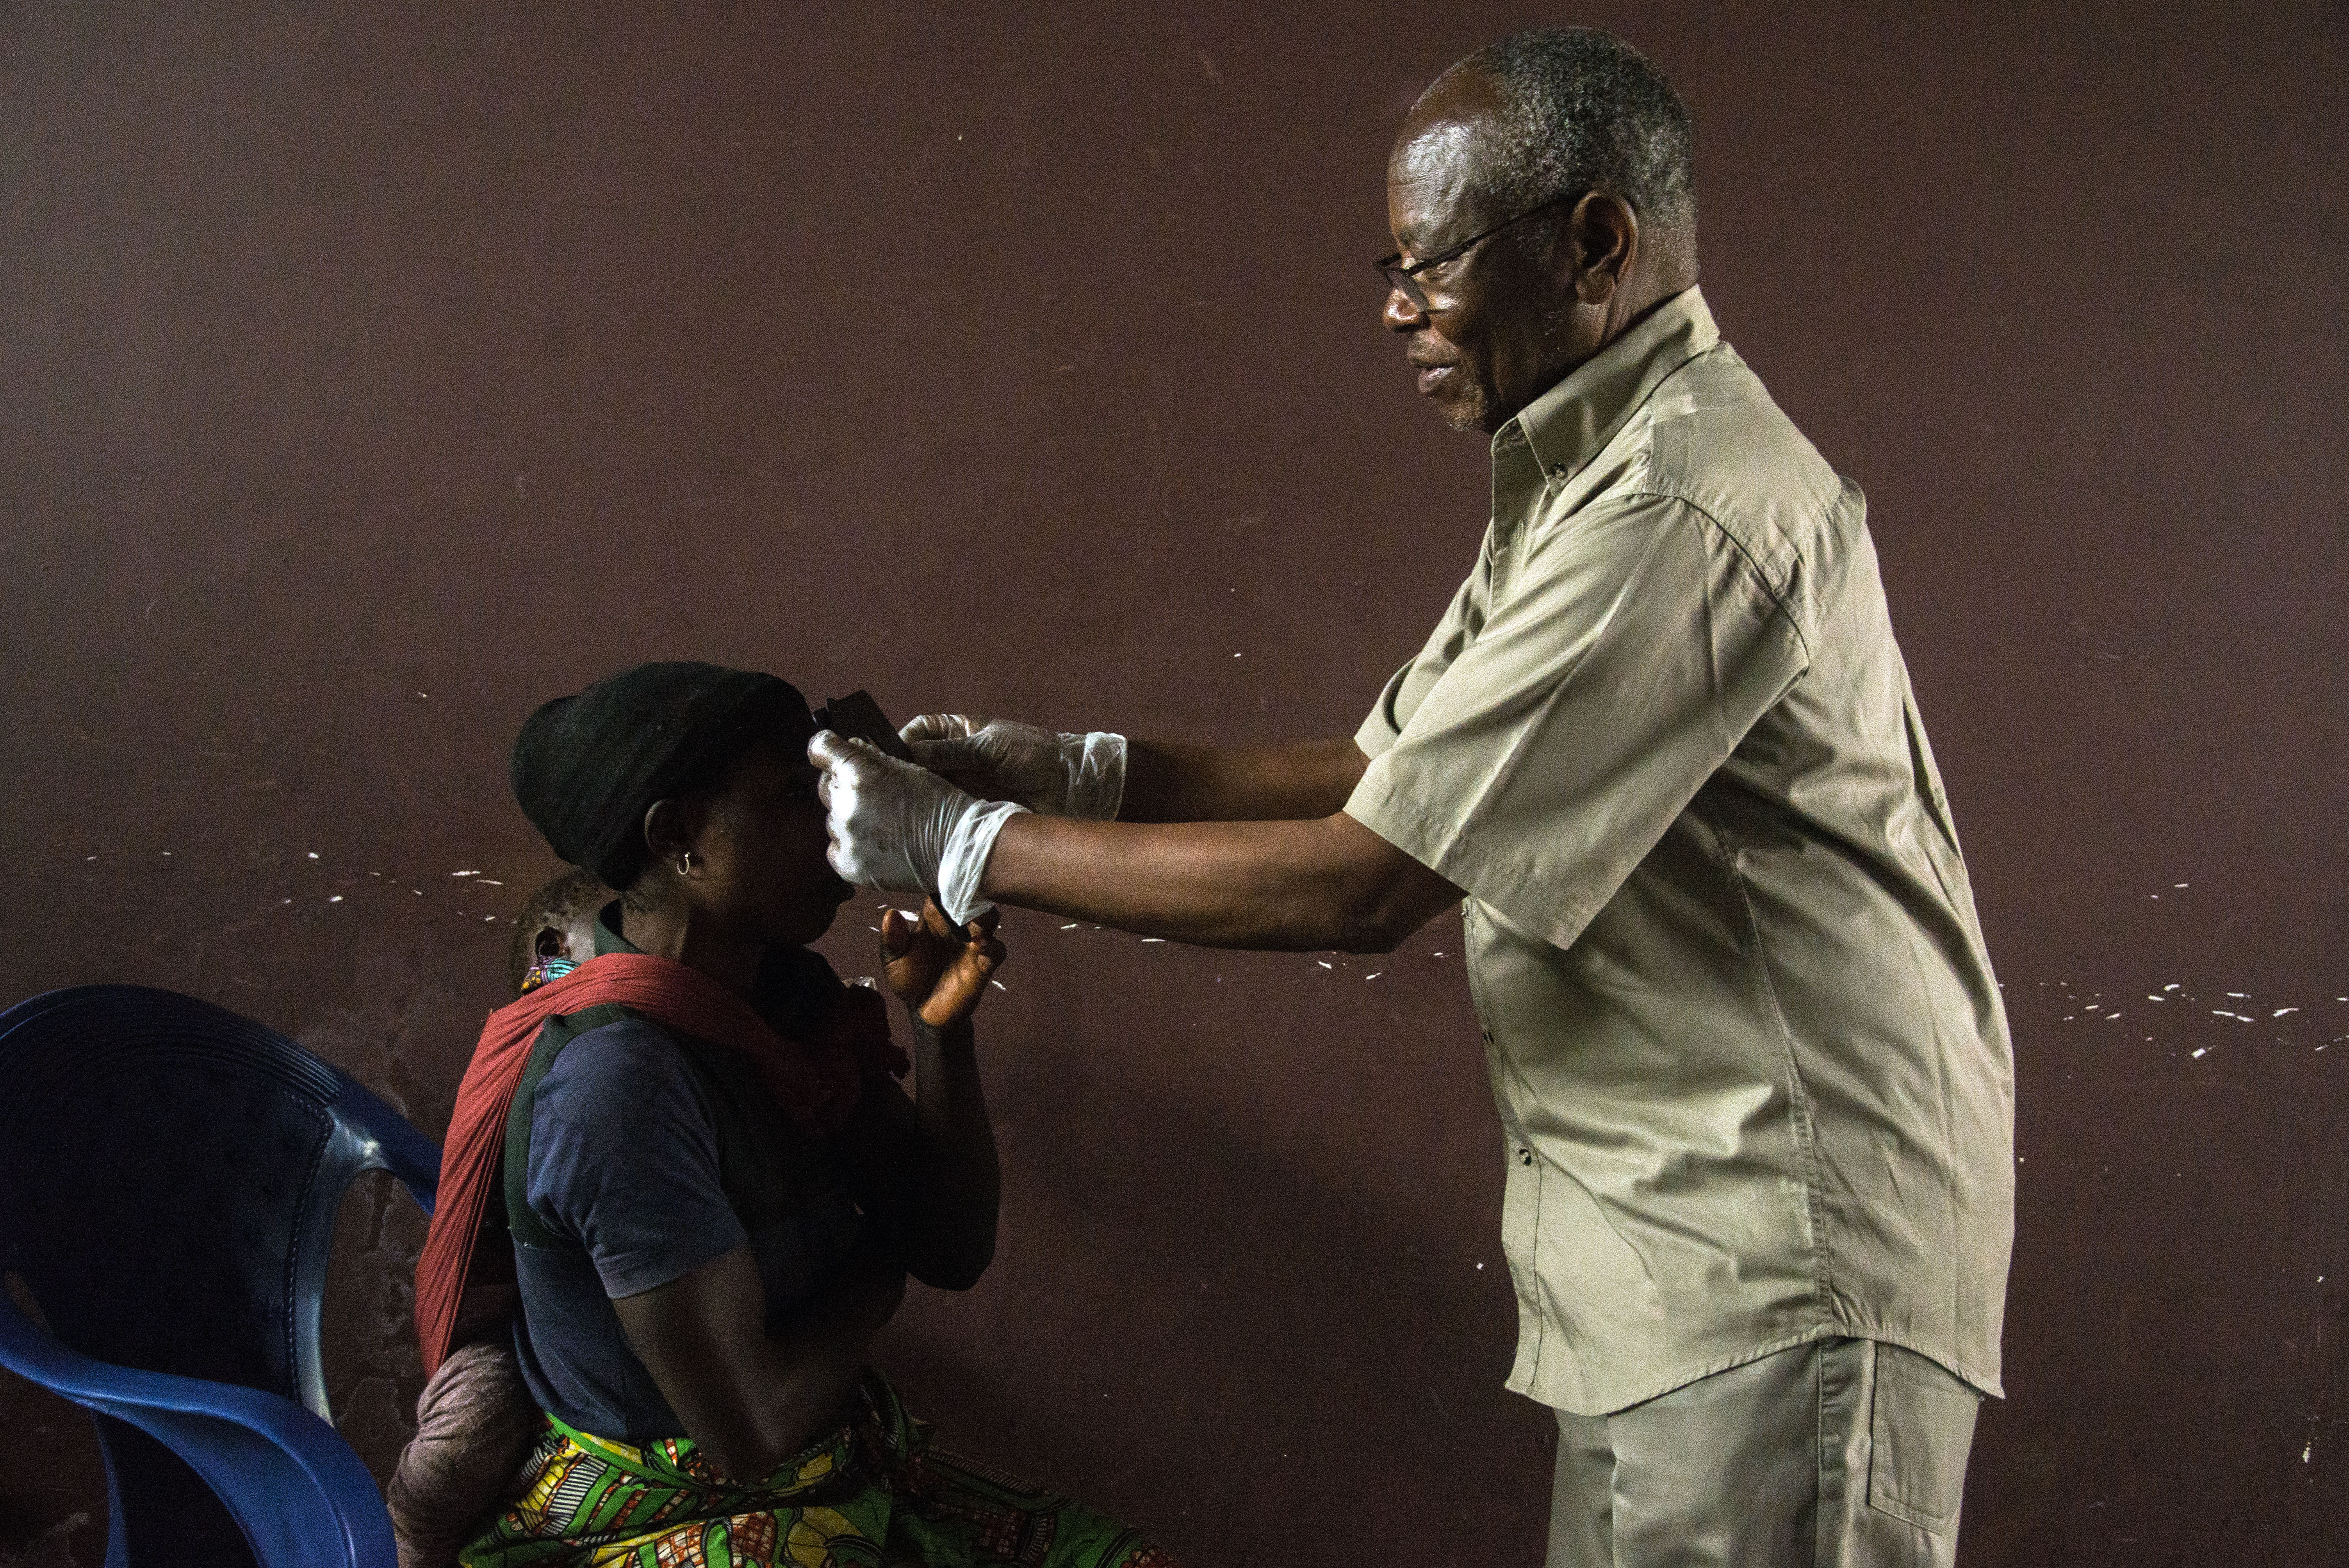 eye test telesphore mumbere drc ebola